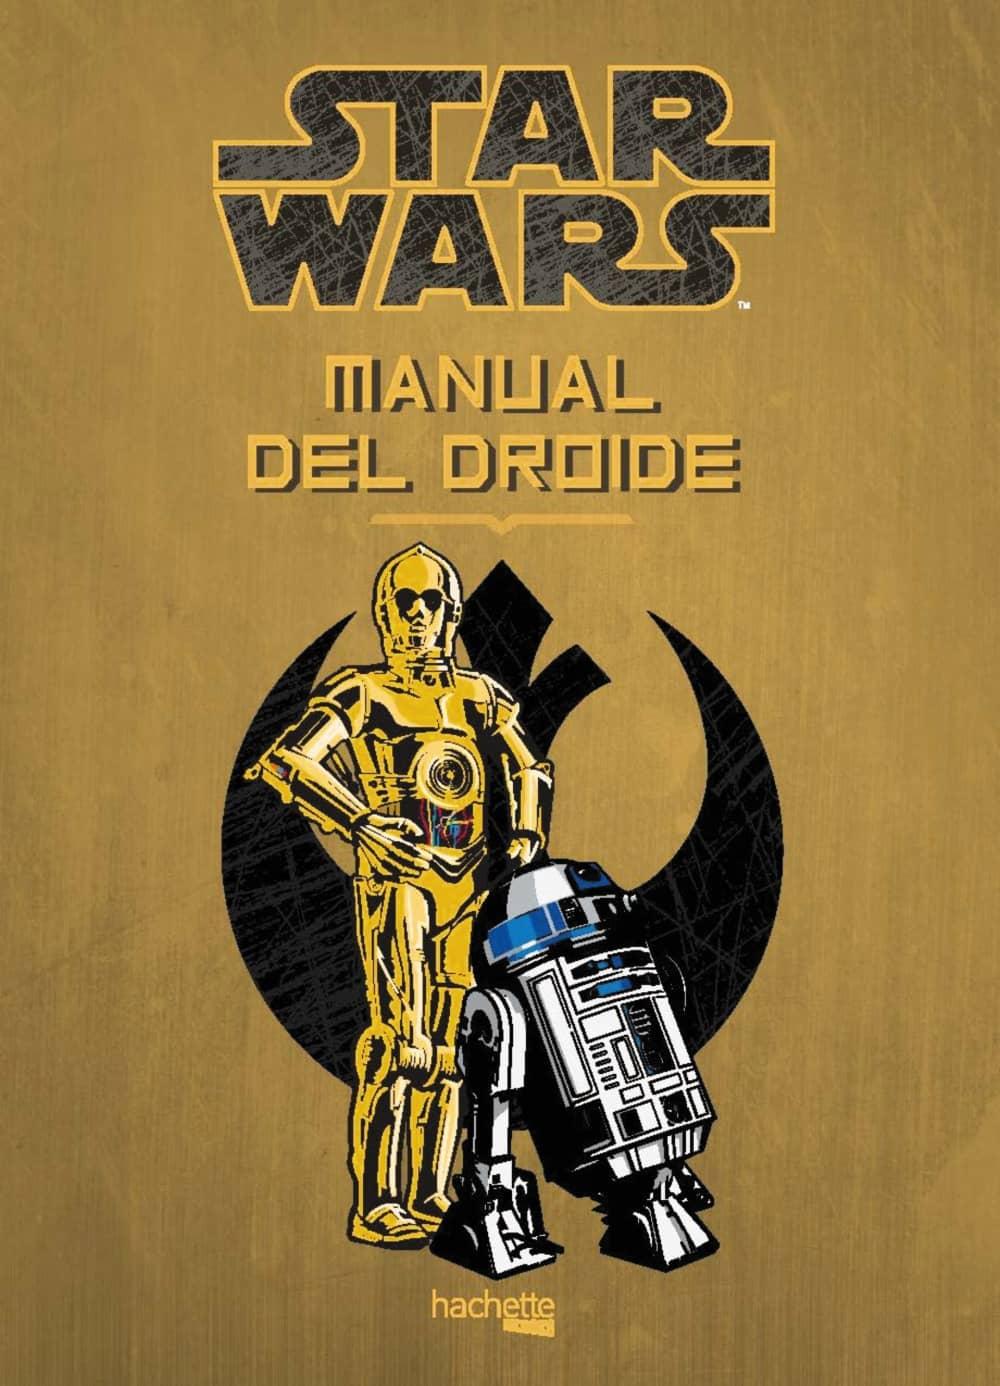 STAR WARS. MANUAL DEL DROIDE